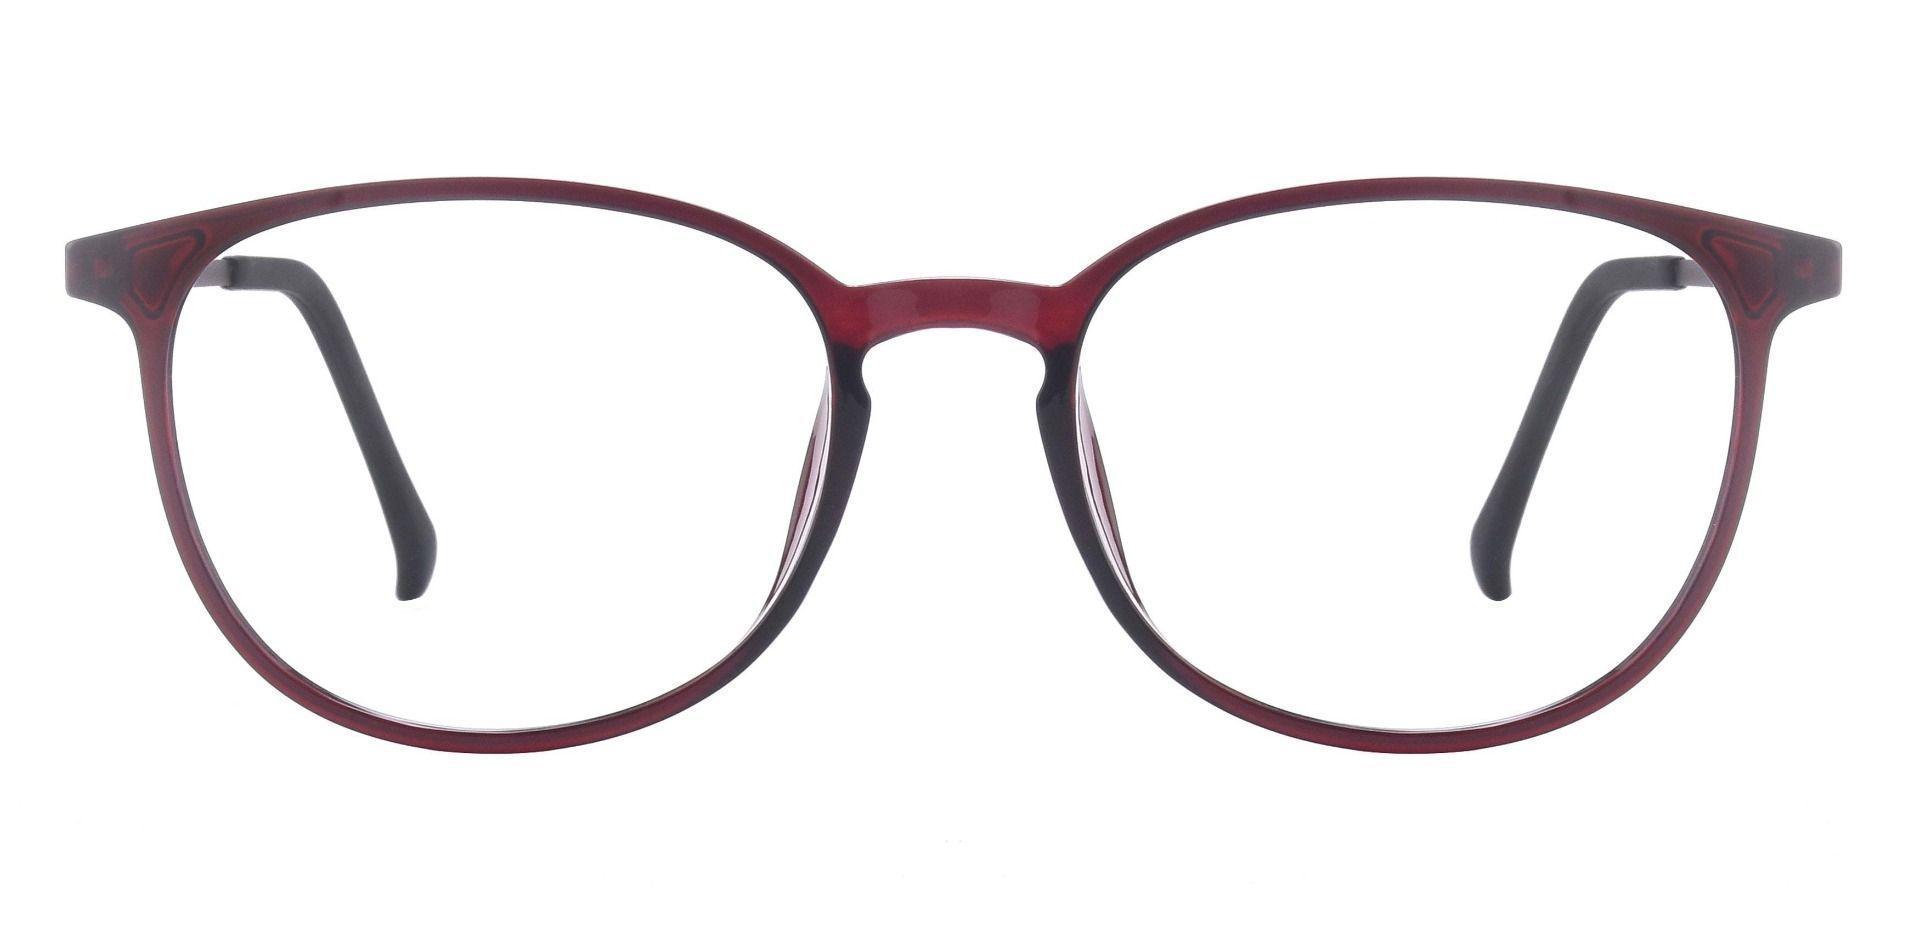 Granite Oval Progressive Glasses - Wine Crystal/brushed Red Temples